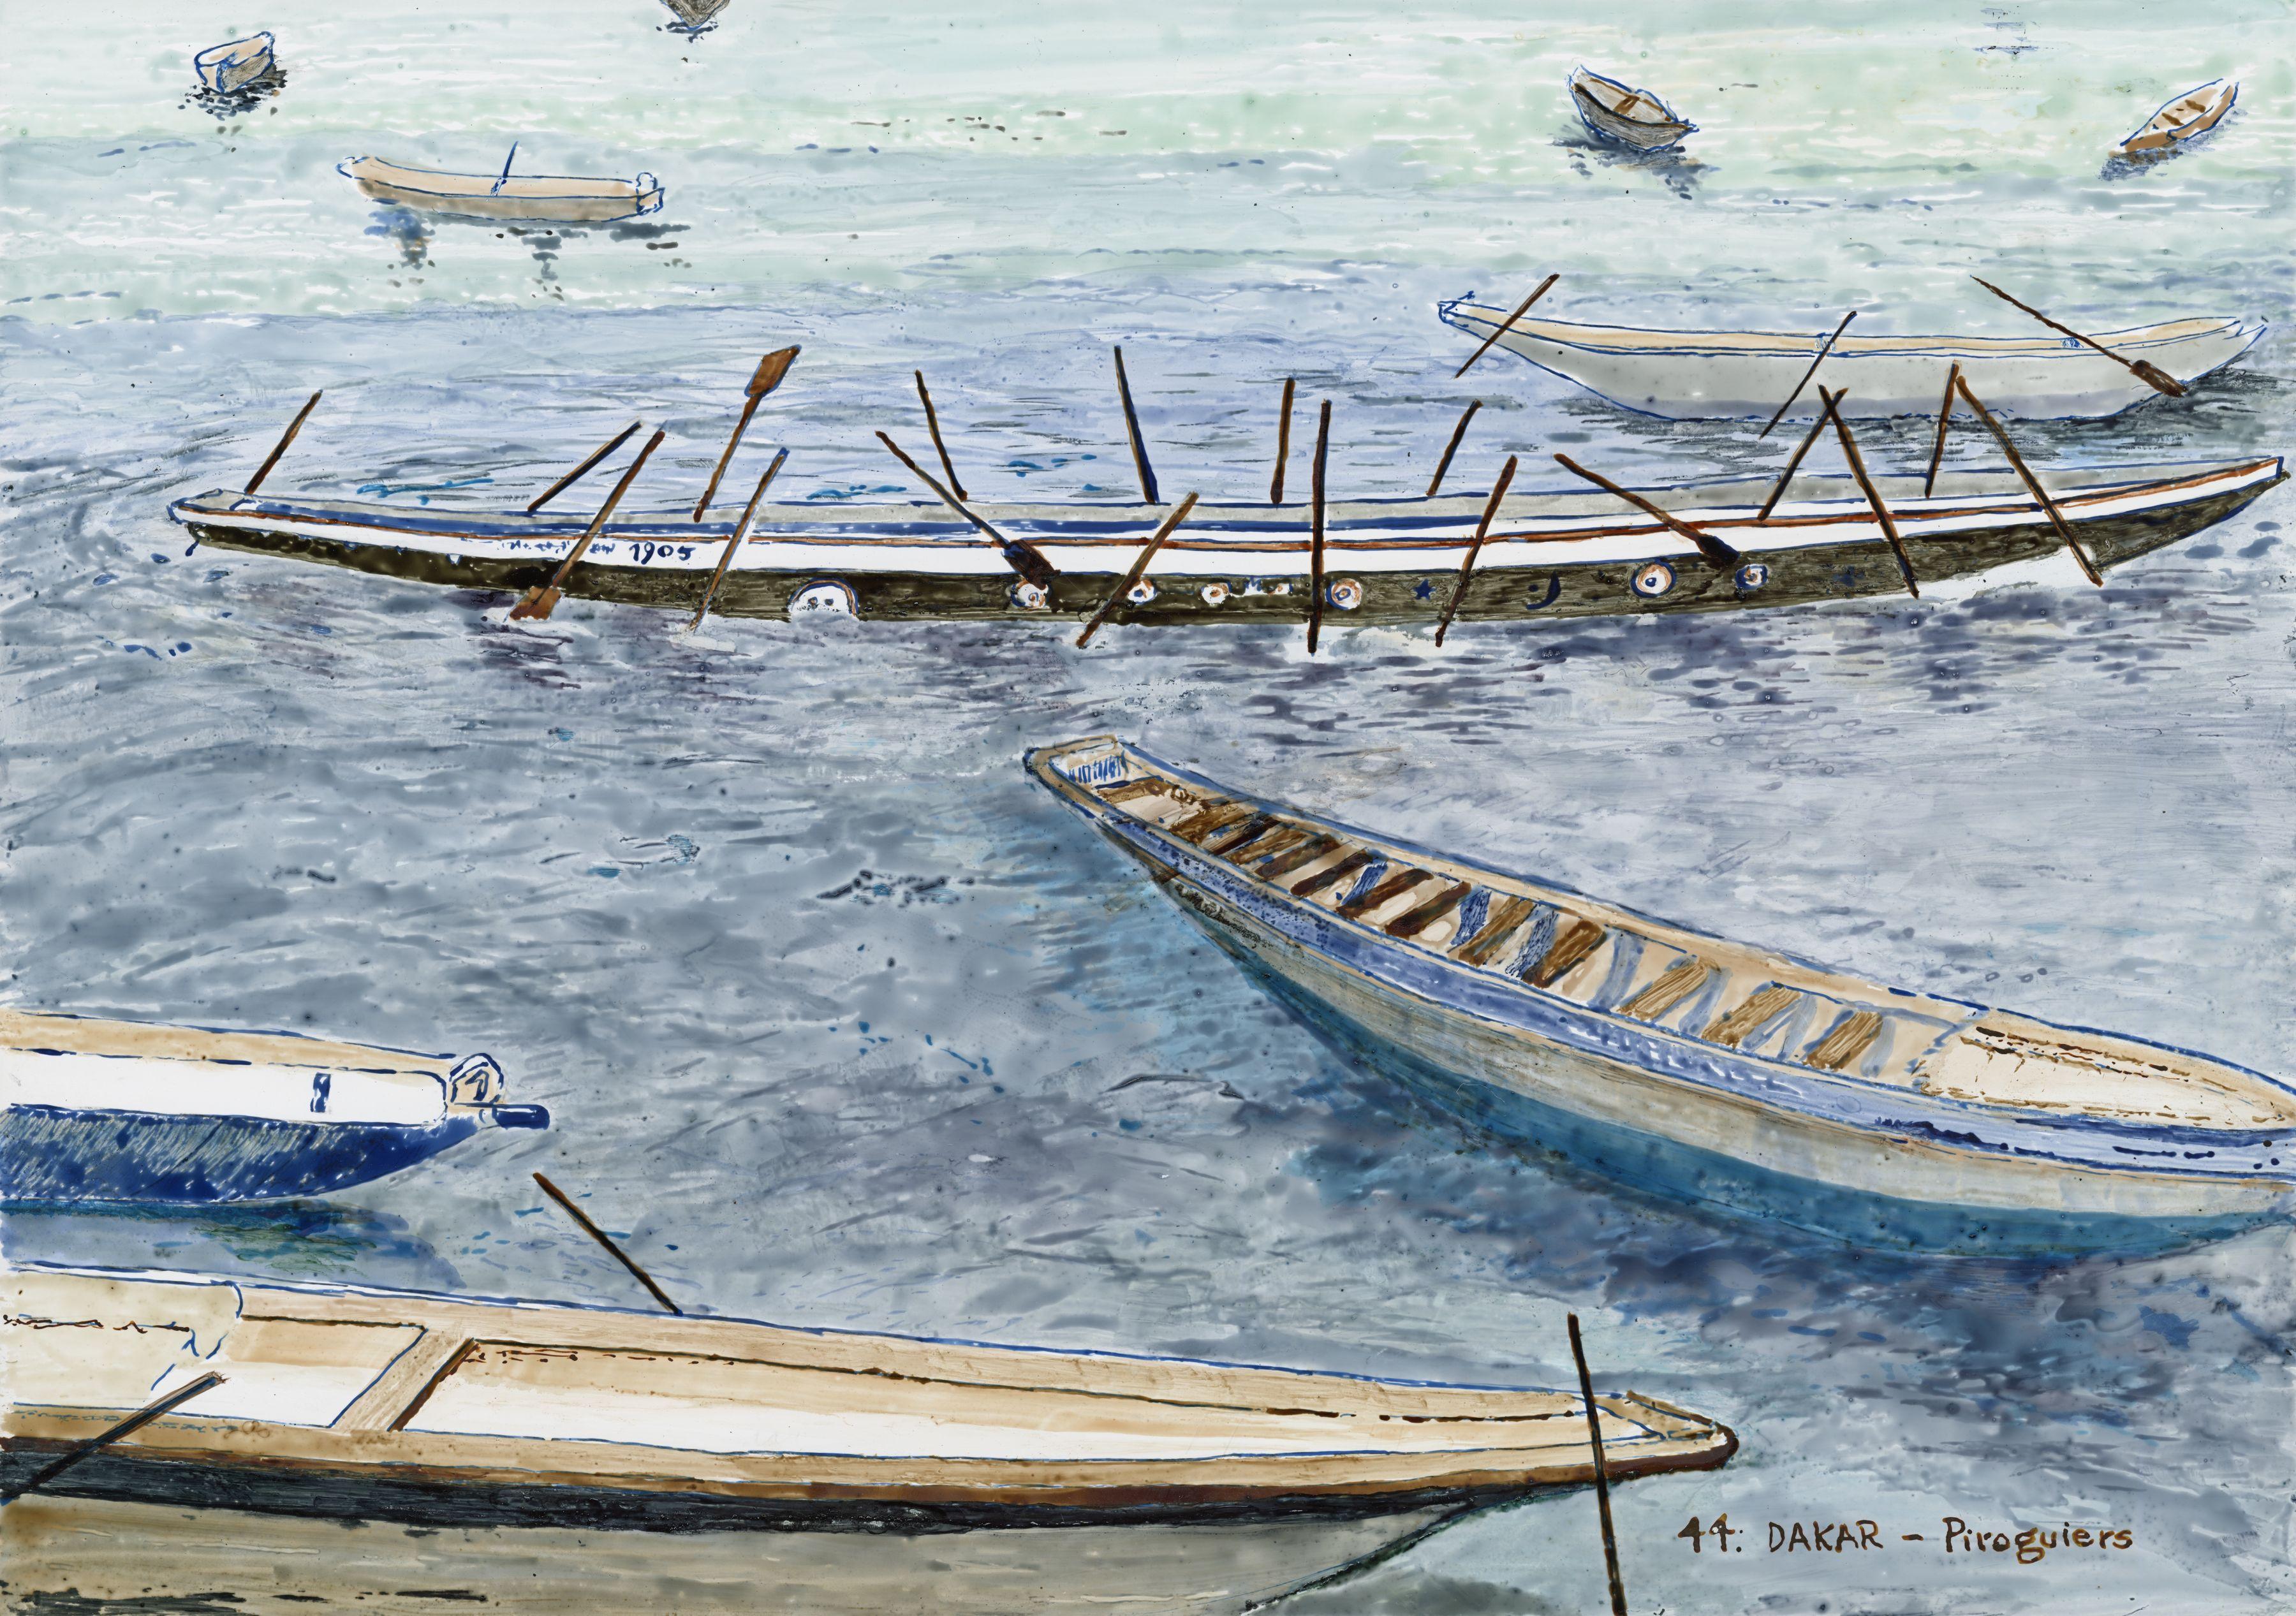 Piroguiers- Dakar, artwork